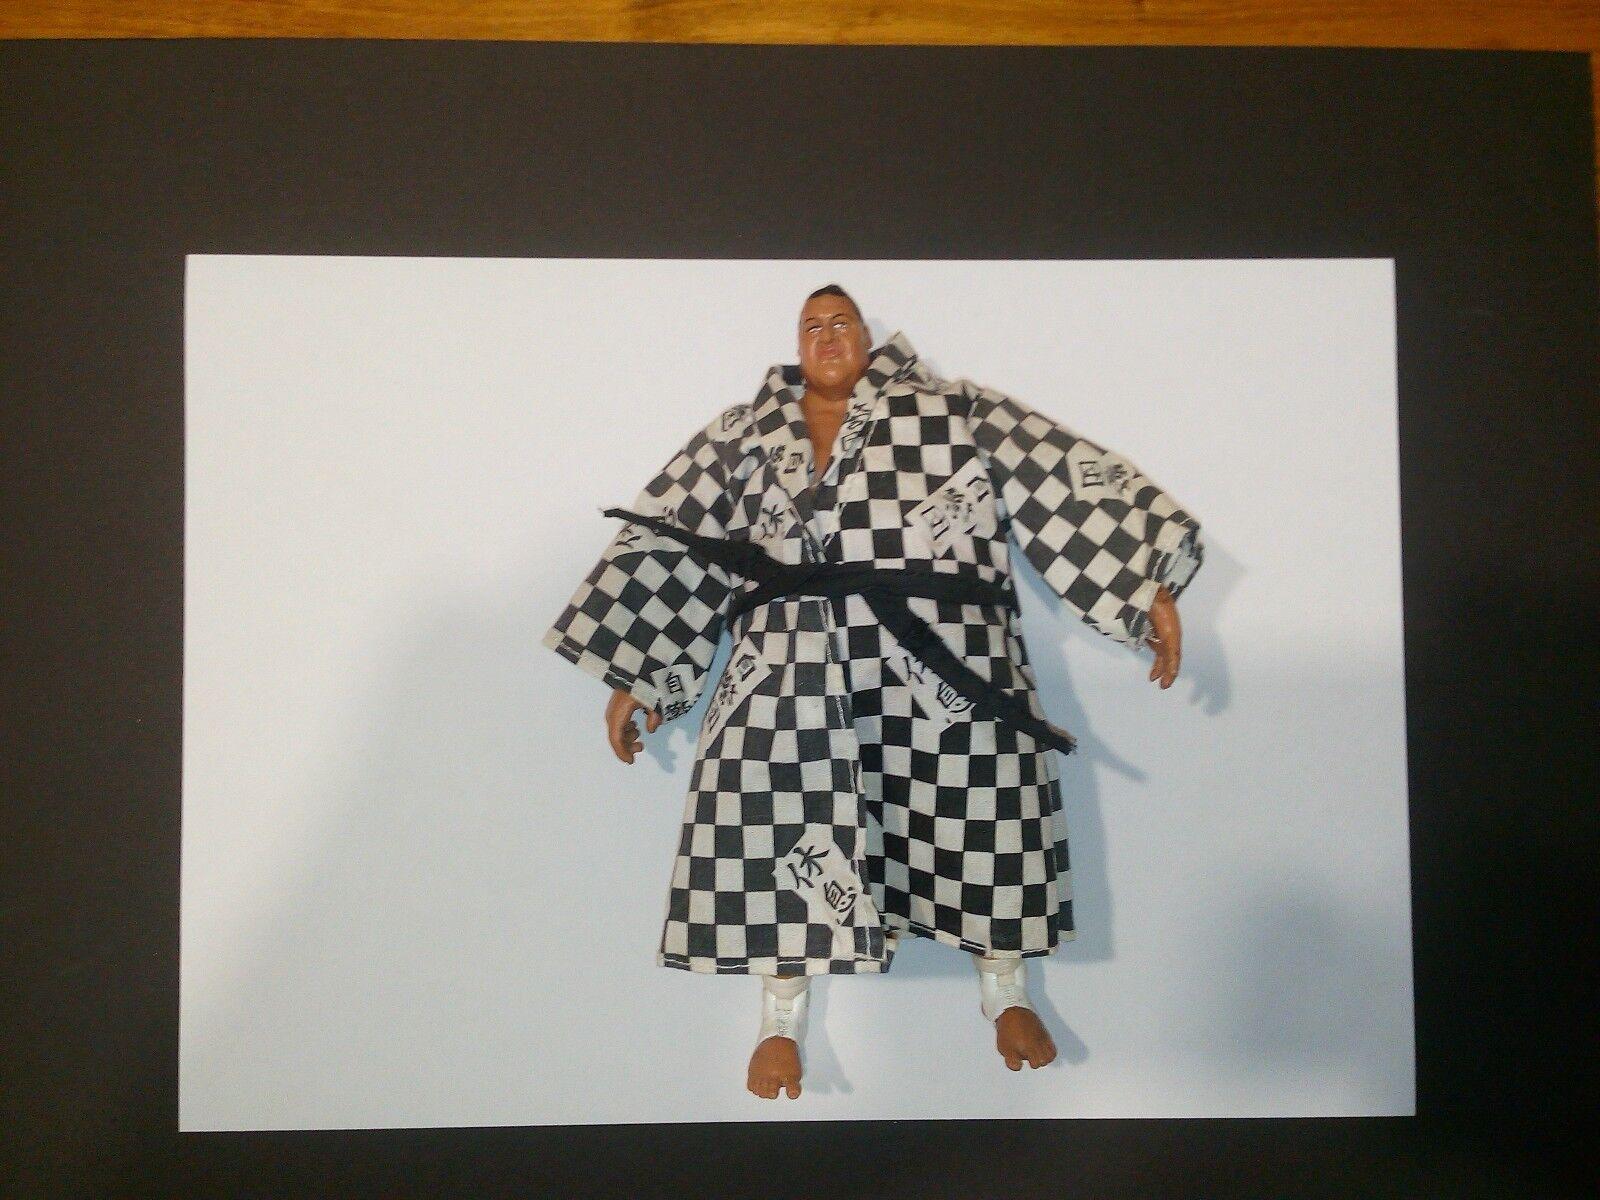 Yokozuna WWE WWF Superstars - Ringside Fest - Exclusive Limited Edition 1 1800